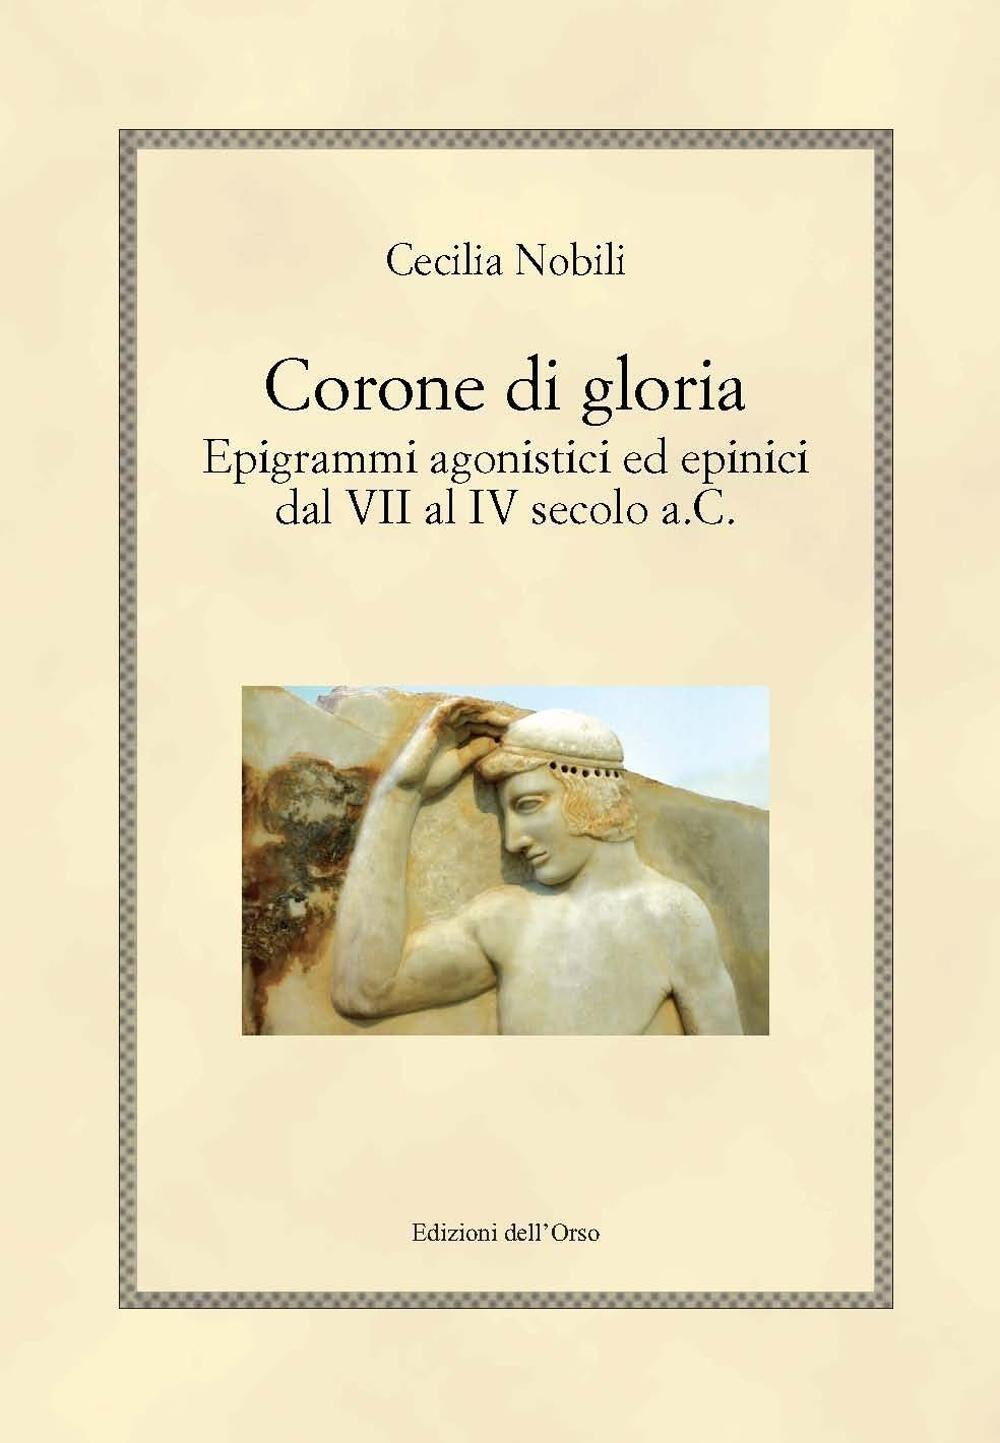 Corone di gloria. Epigrammi agonistici ed epinici dal VII al IV secolo a.C.